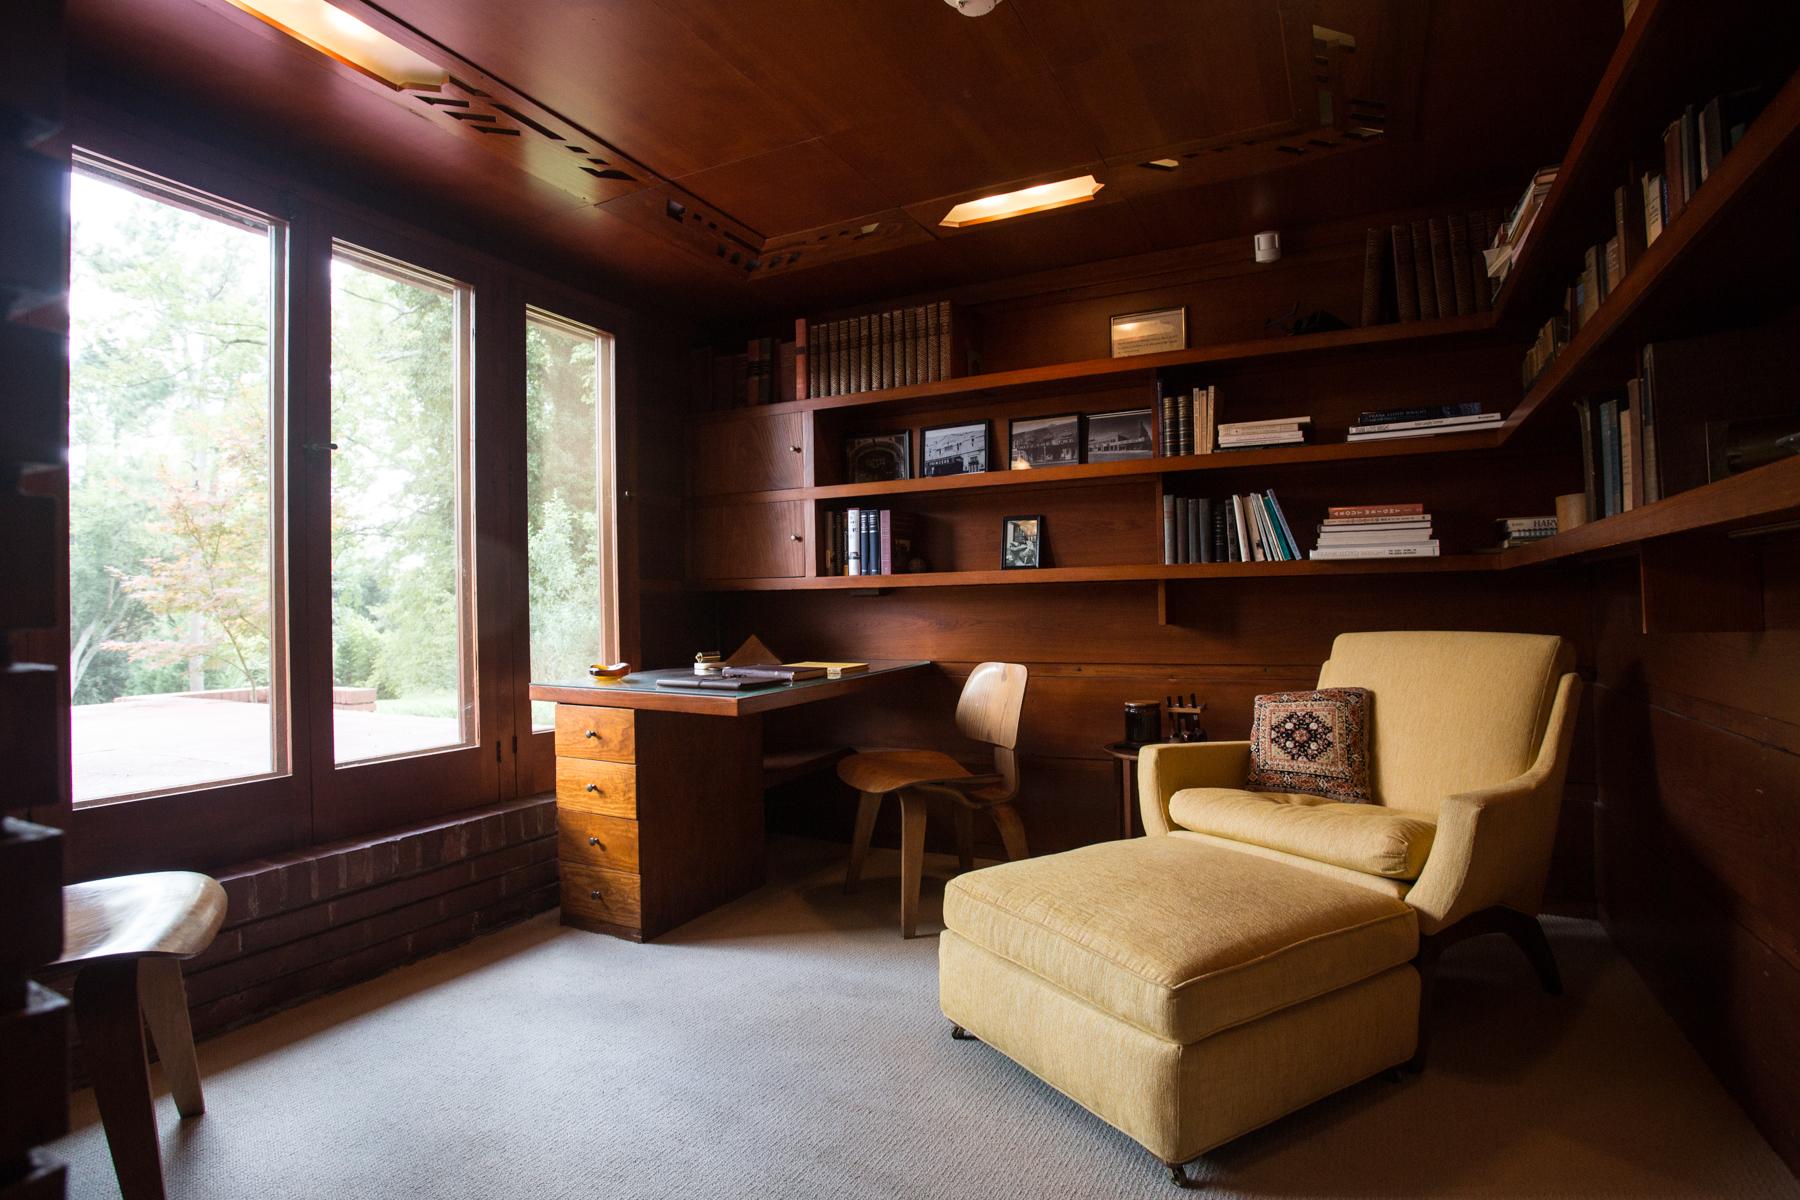 rosenbaum house-201508285760.jpg